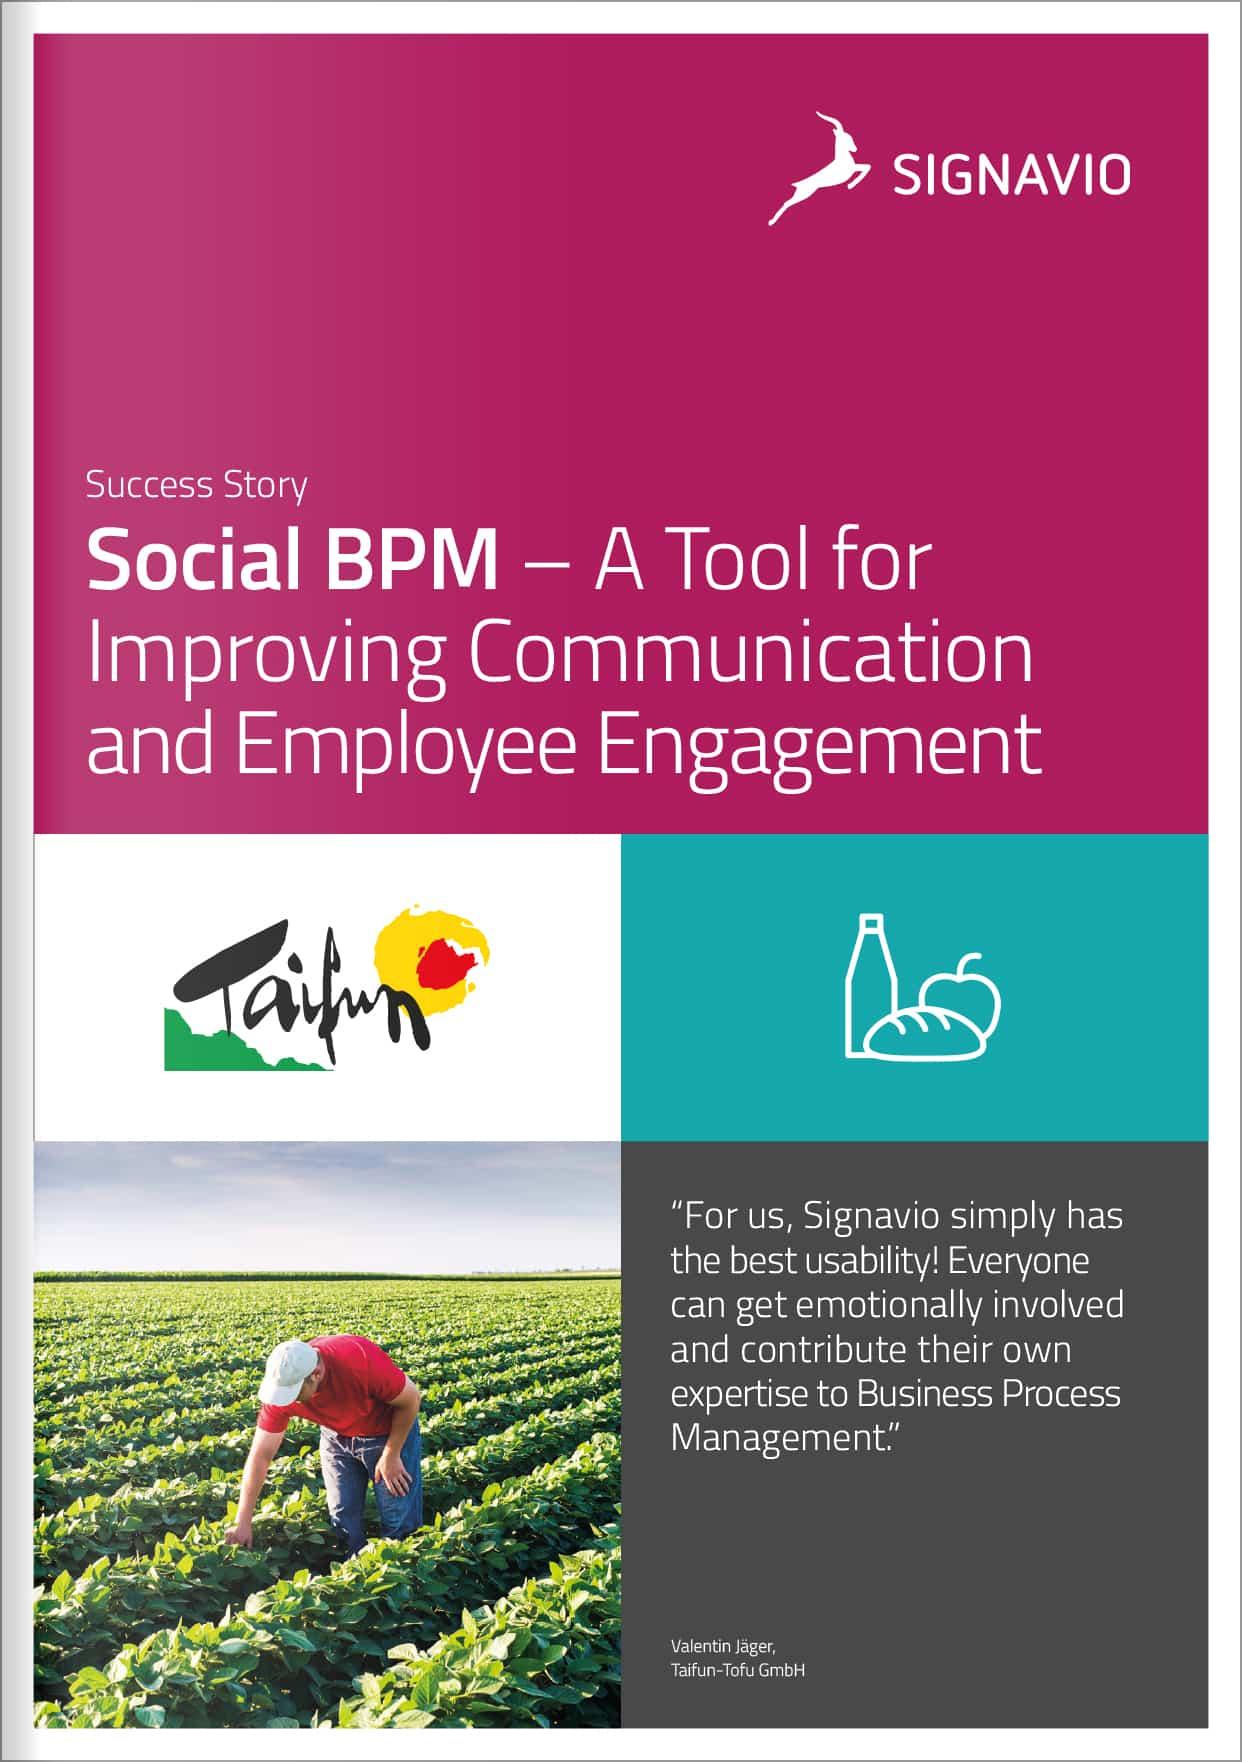 Success Story - Social BPM Taifun-Tofu GmbH